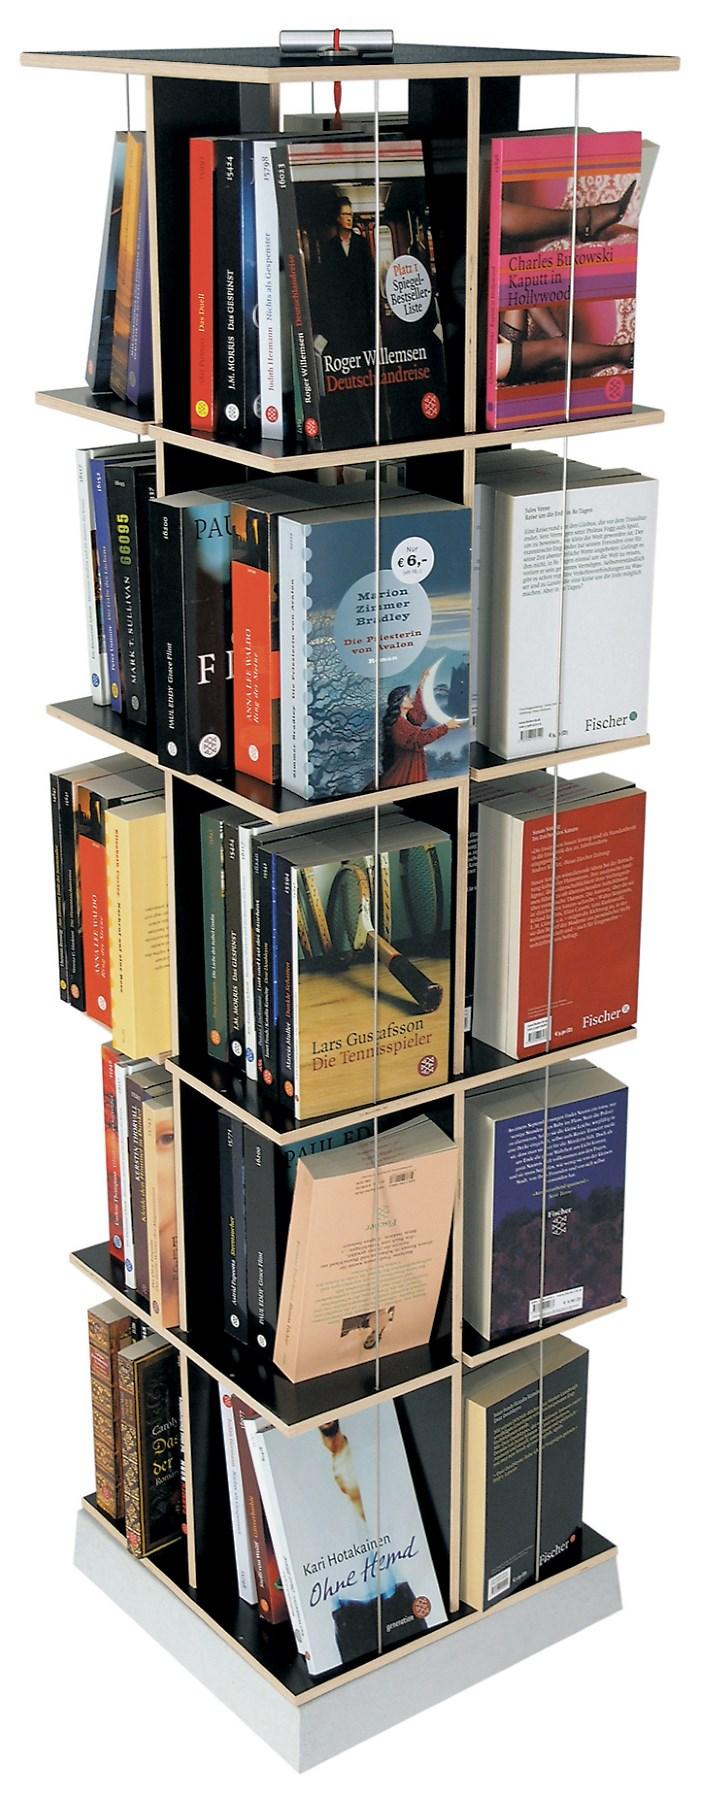 Buchstabler Bücherturm, DVD-Regal Nils Holger Moormann